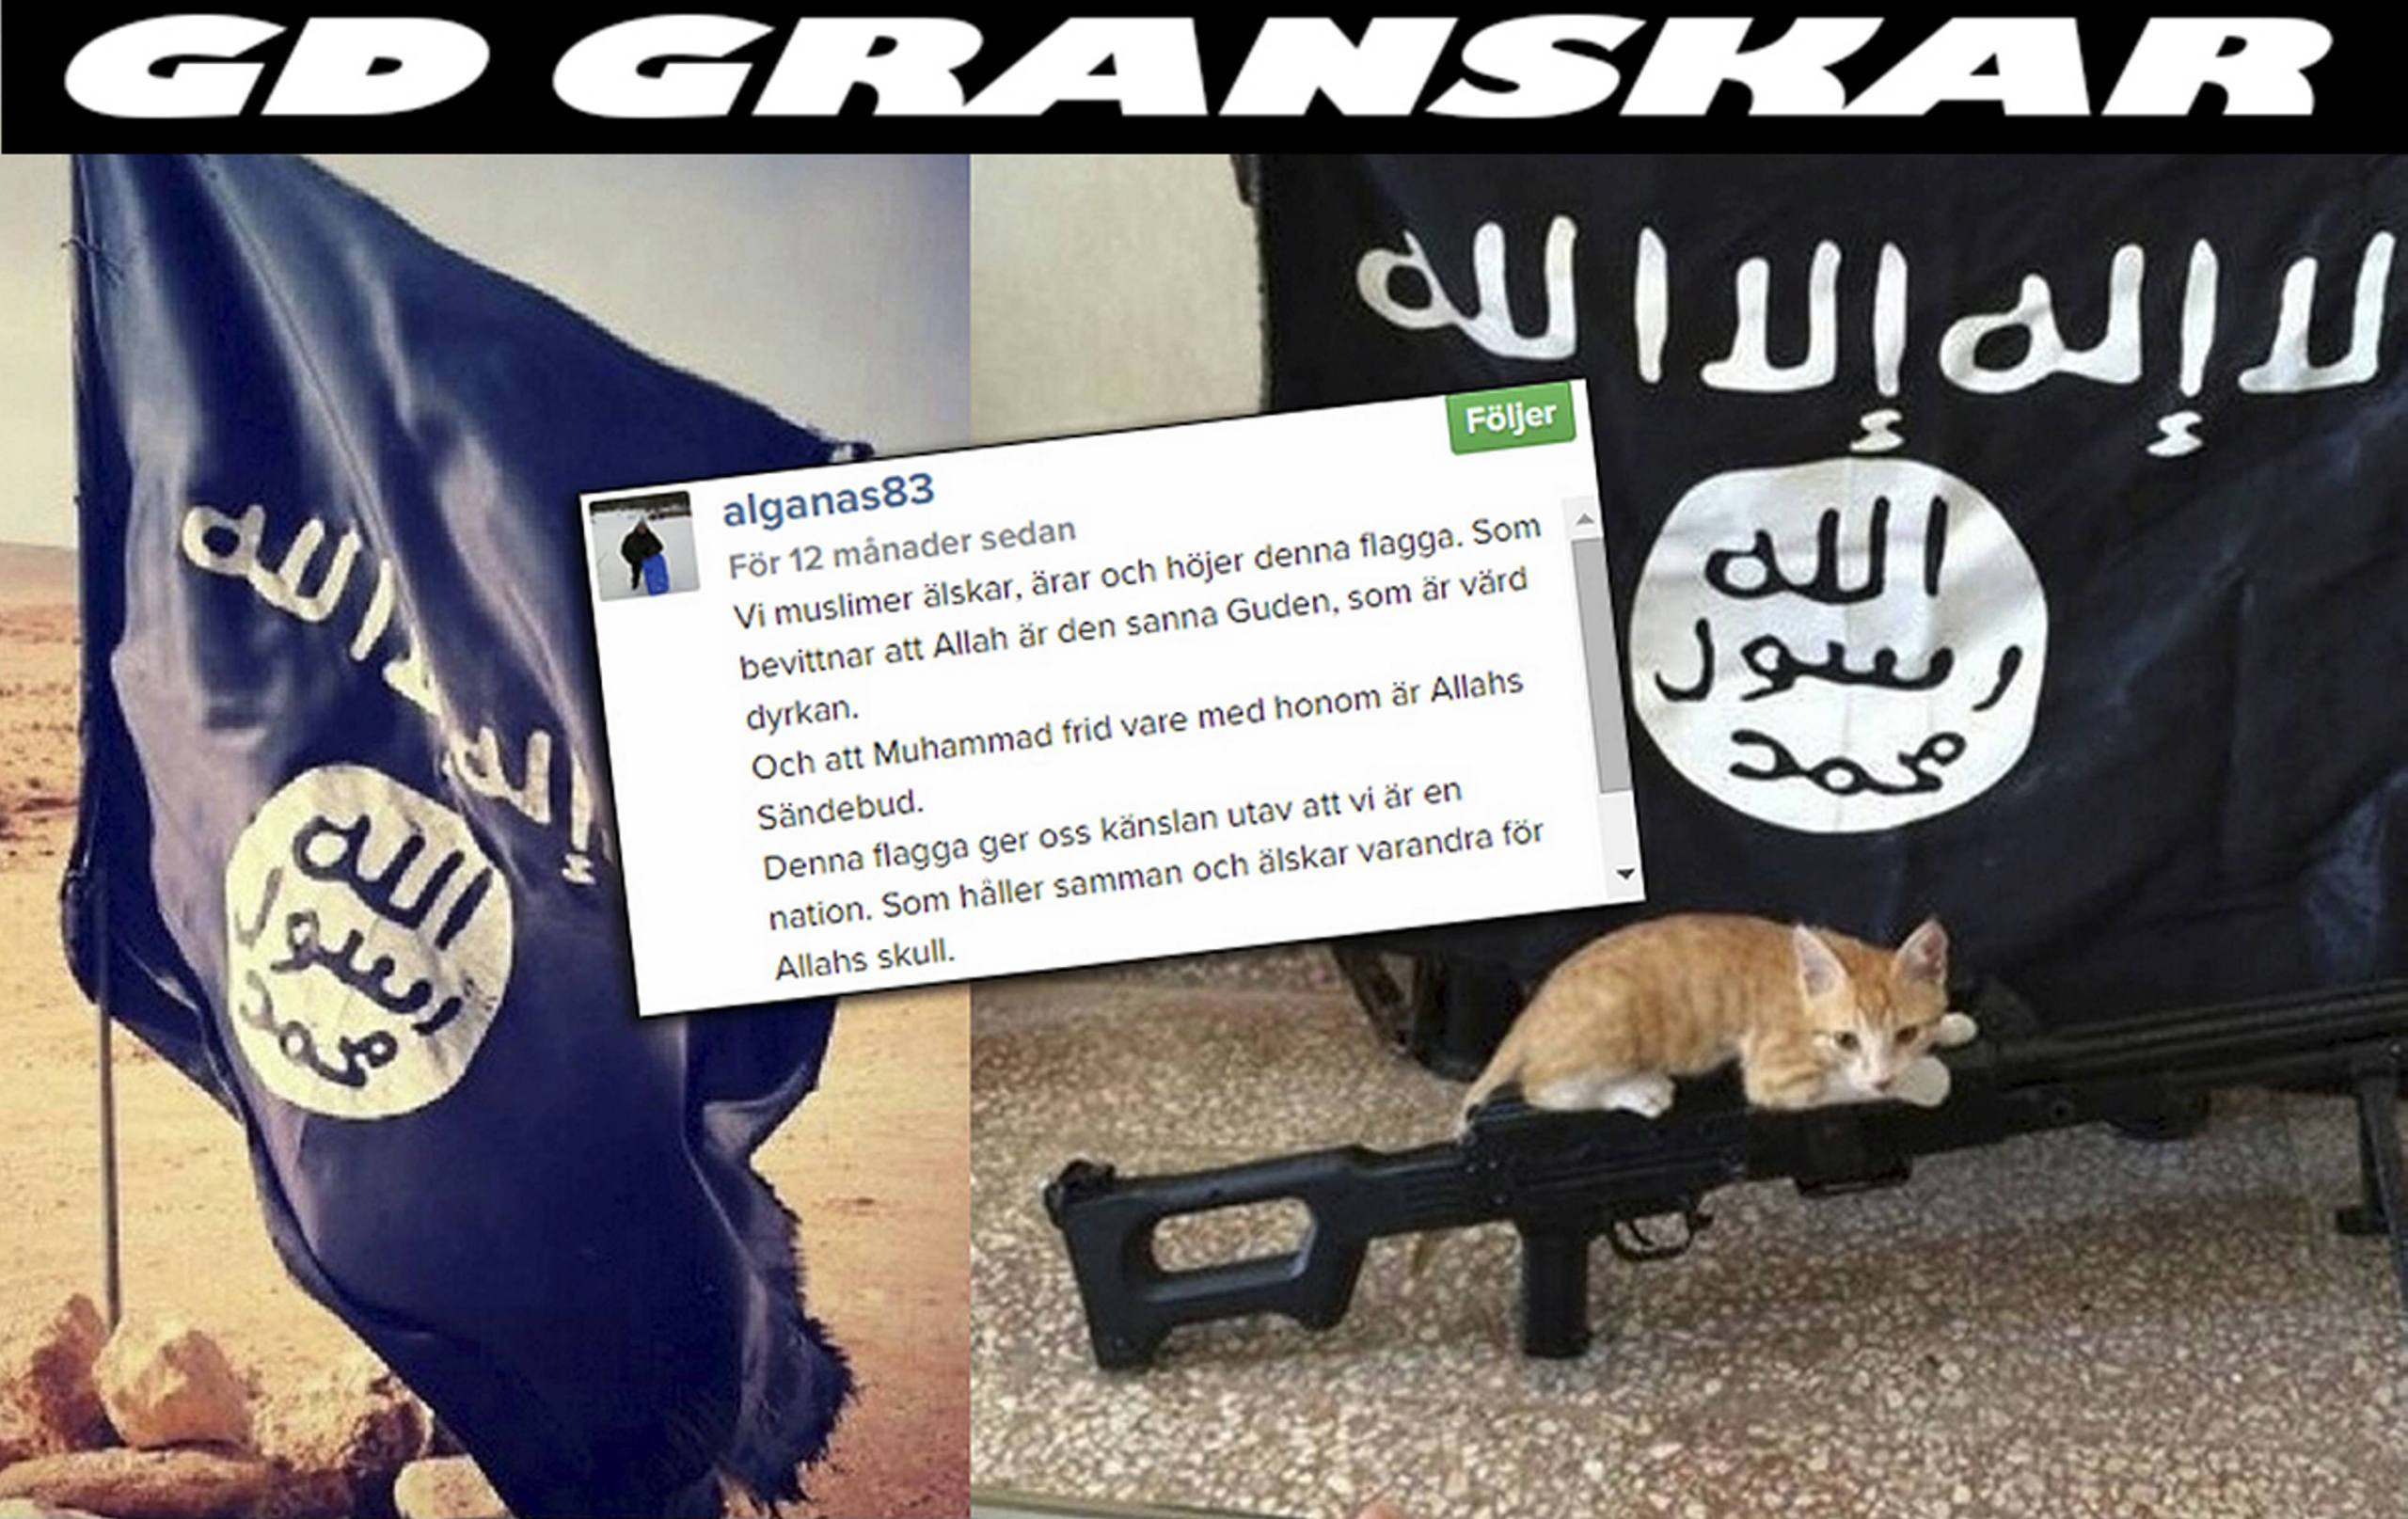 Experter dodshoten islamistisk propaganda